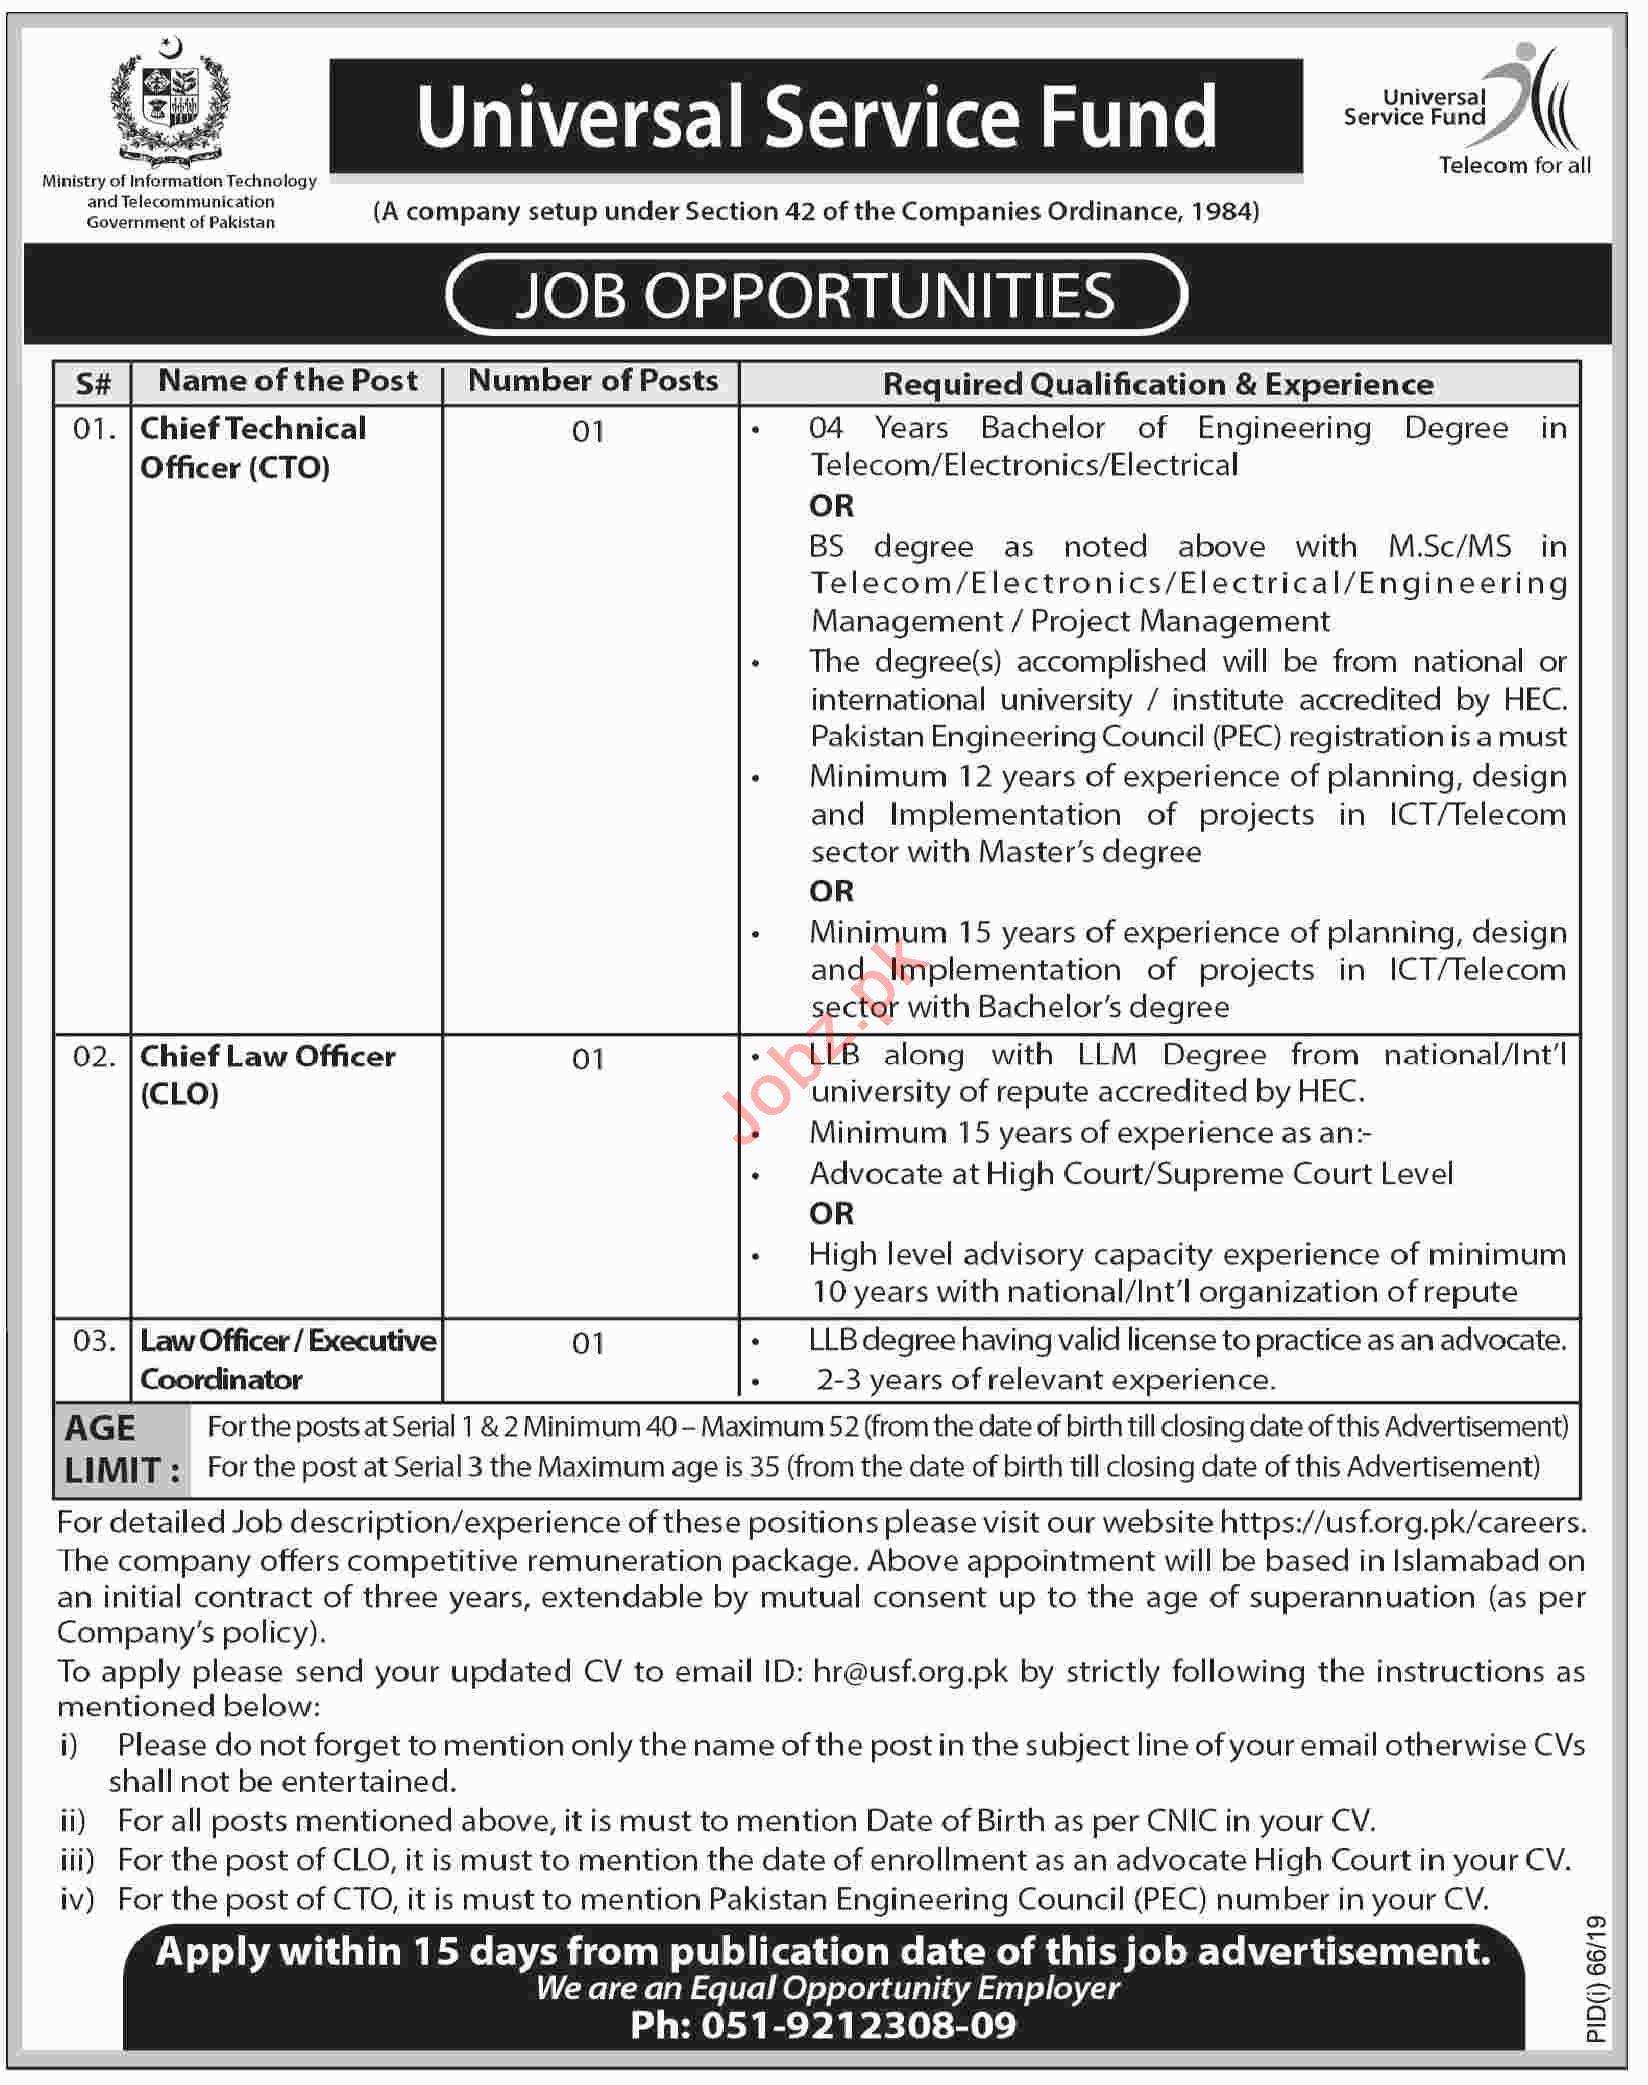 MOIT Jobs 2019 in Islamabad